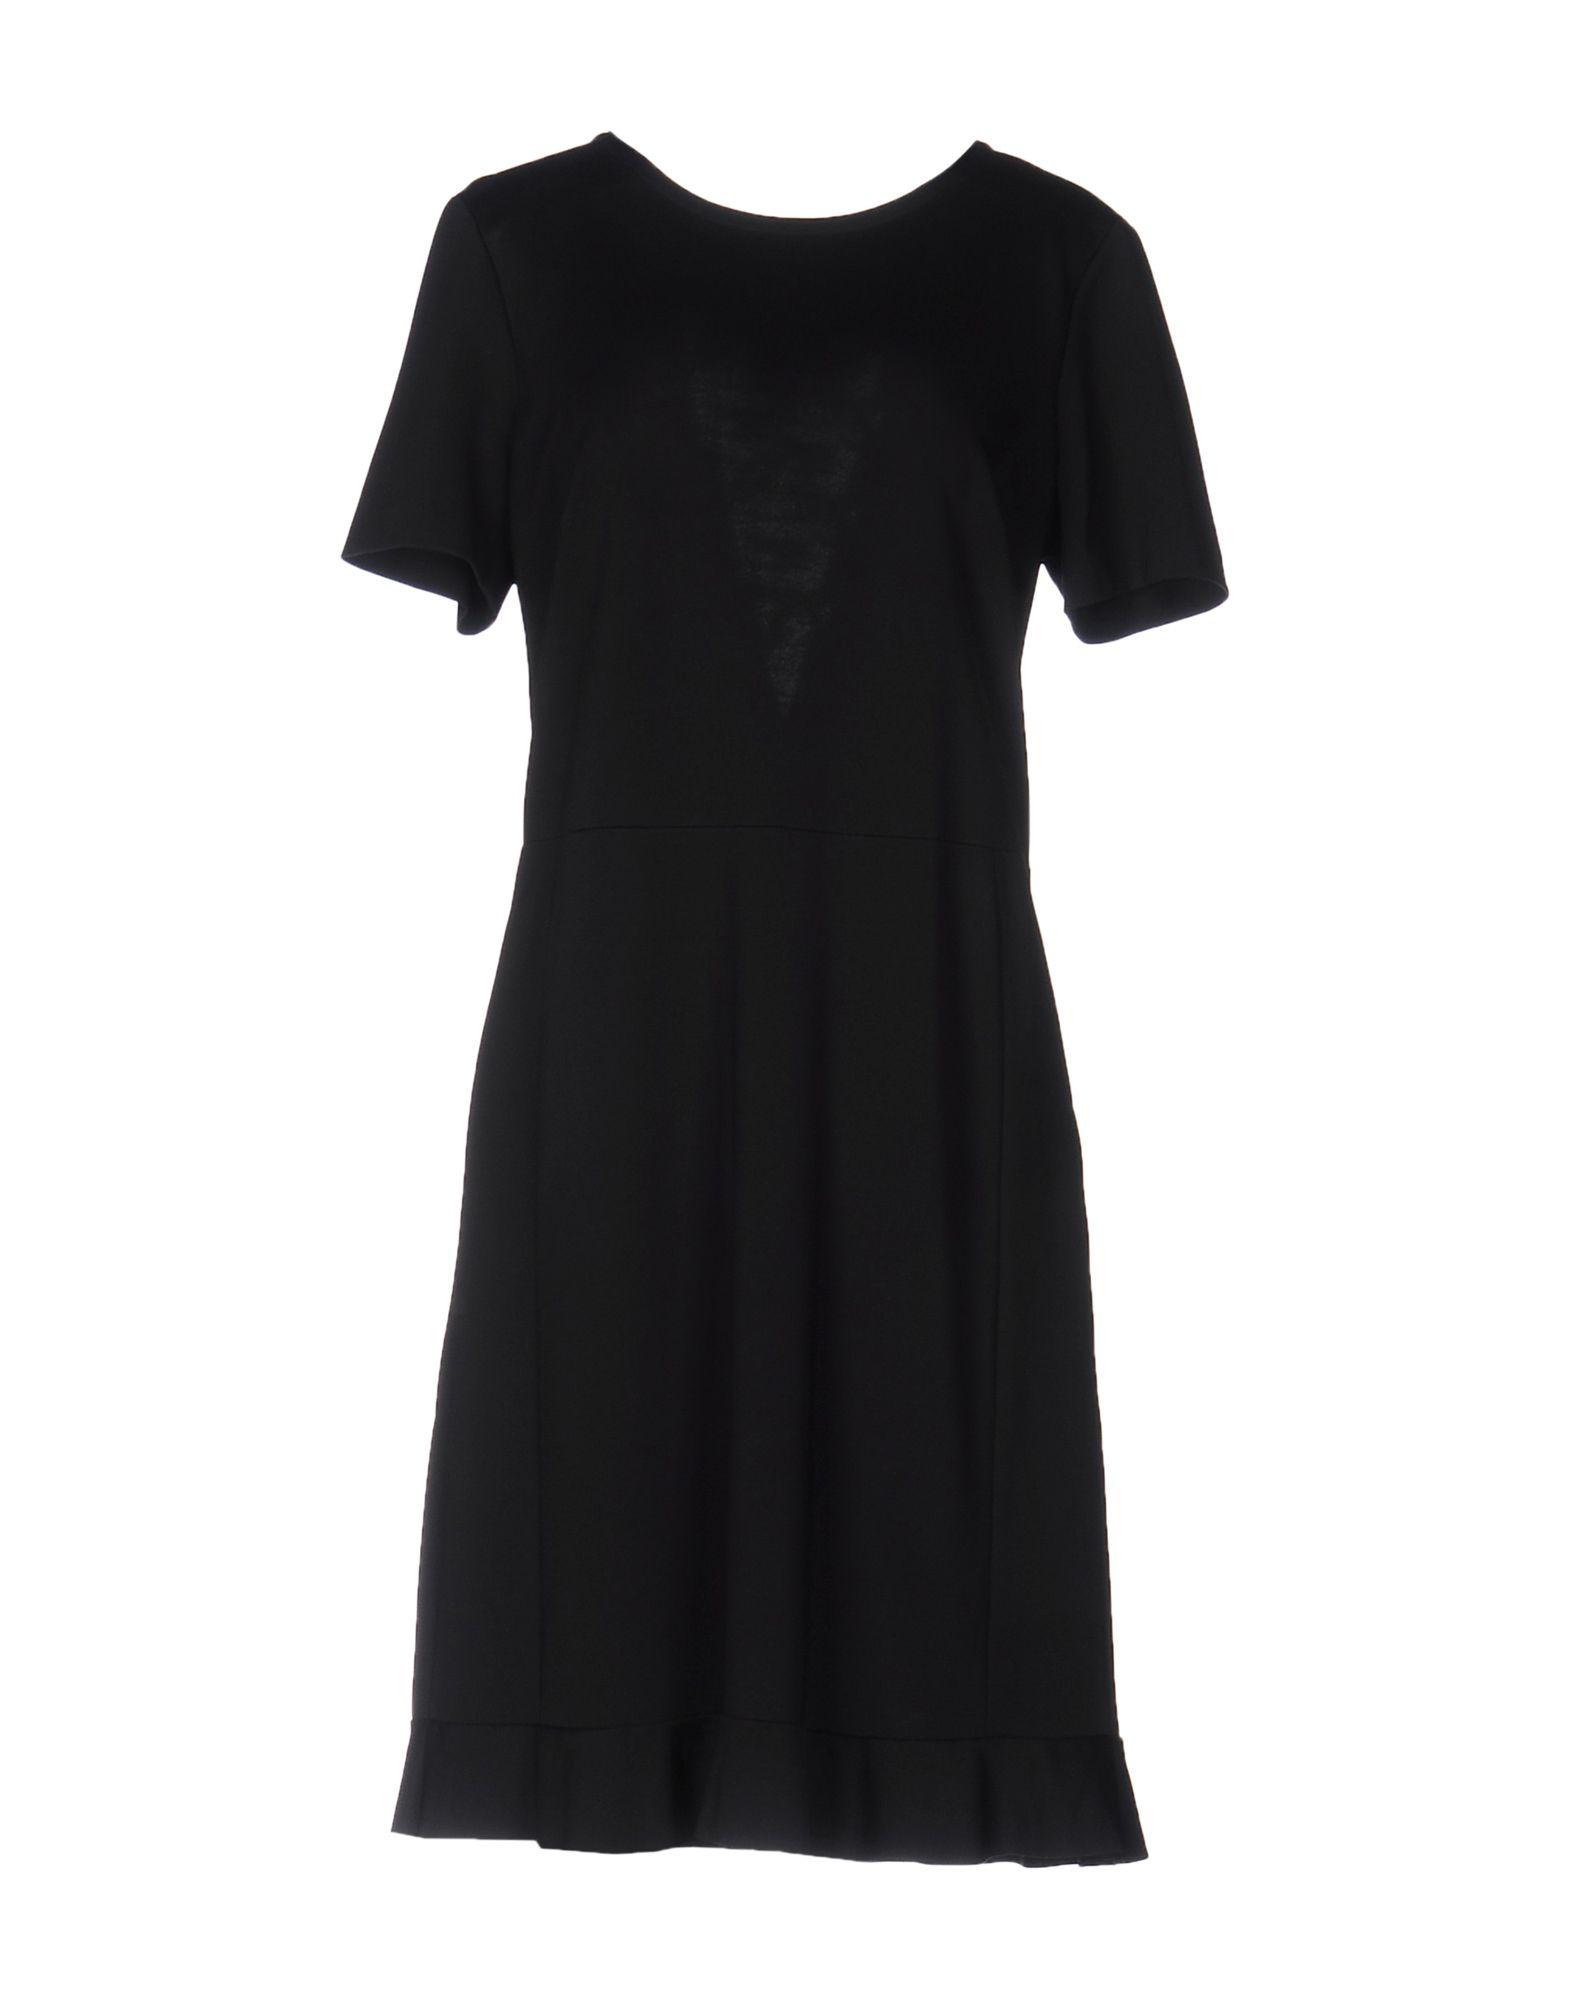 ANNA RACHELE JEANS COLLECTION Короткое платье anna rachele jeans collection платье до колена